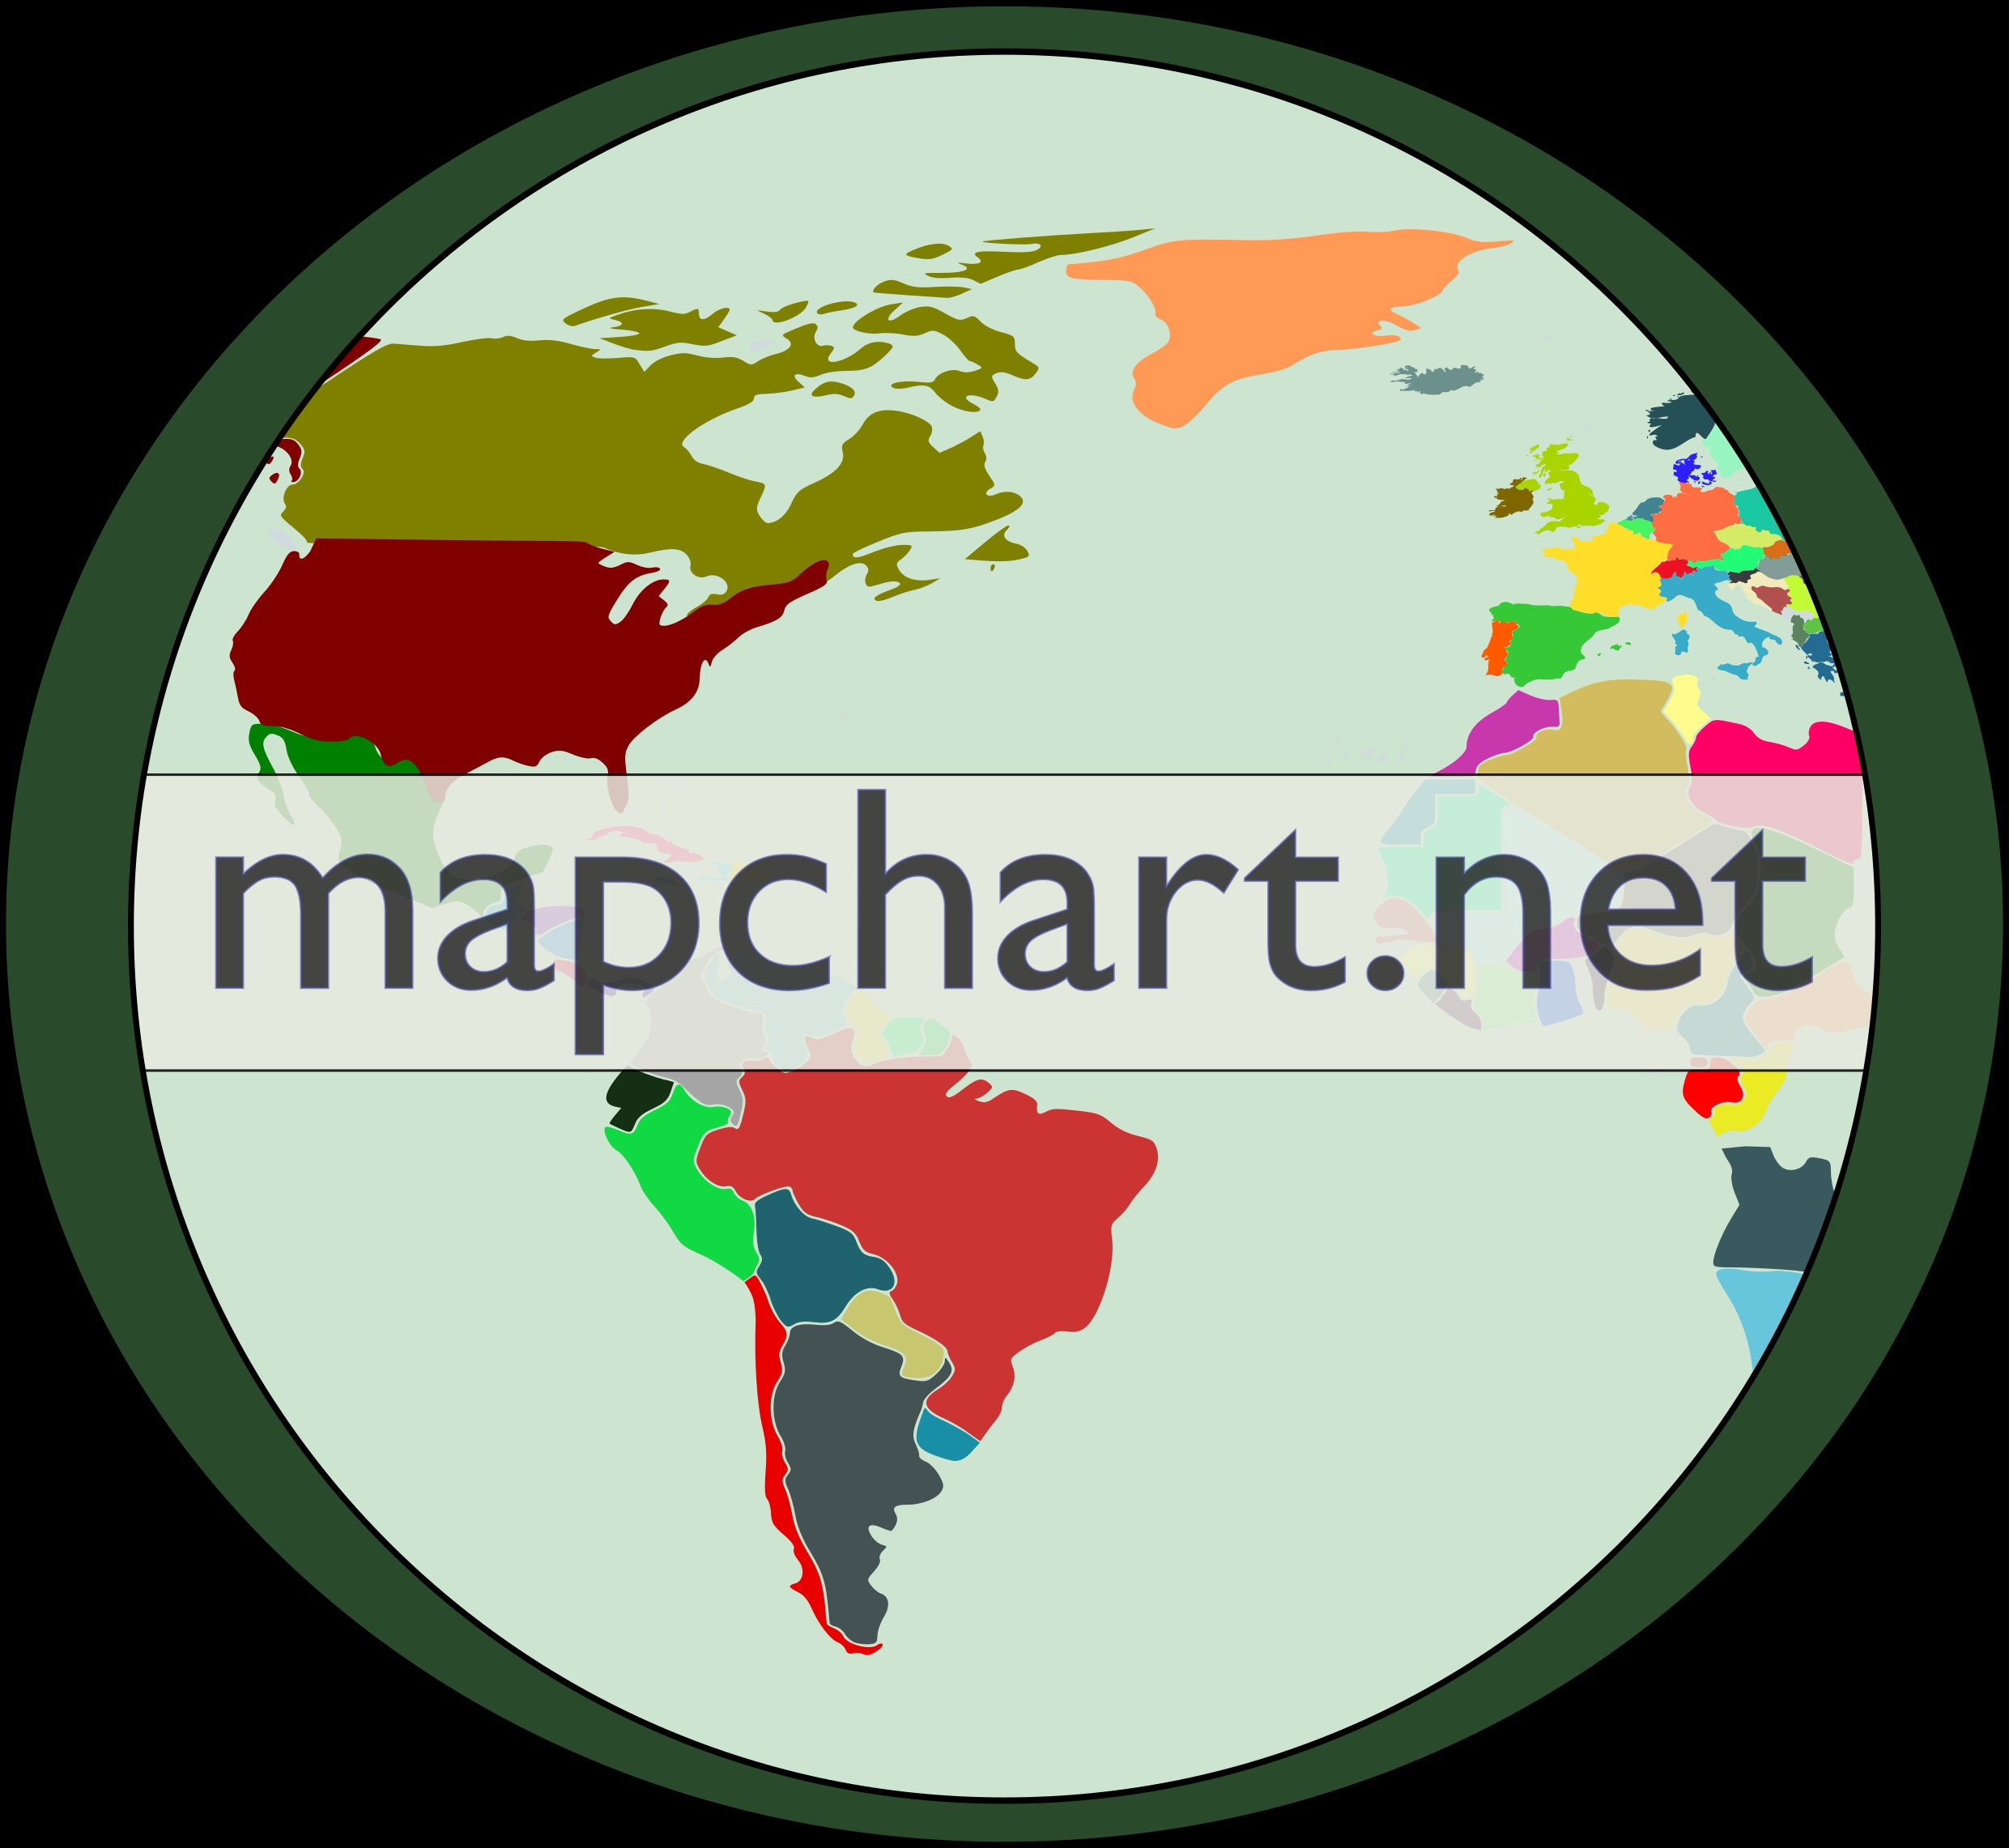 mapchart